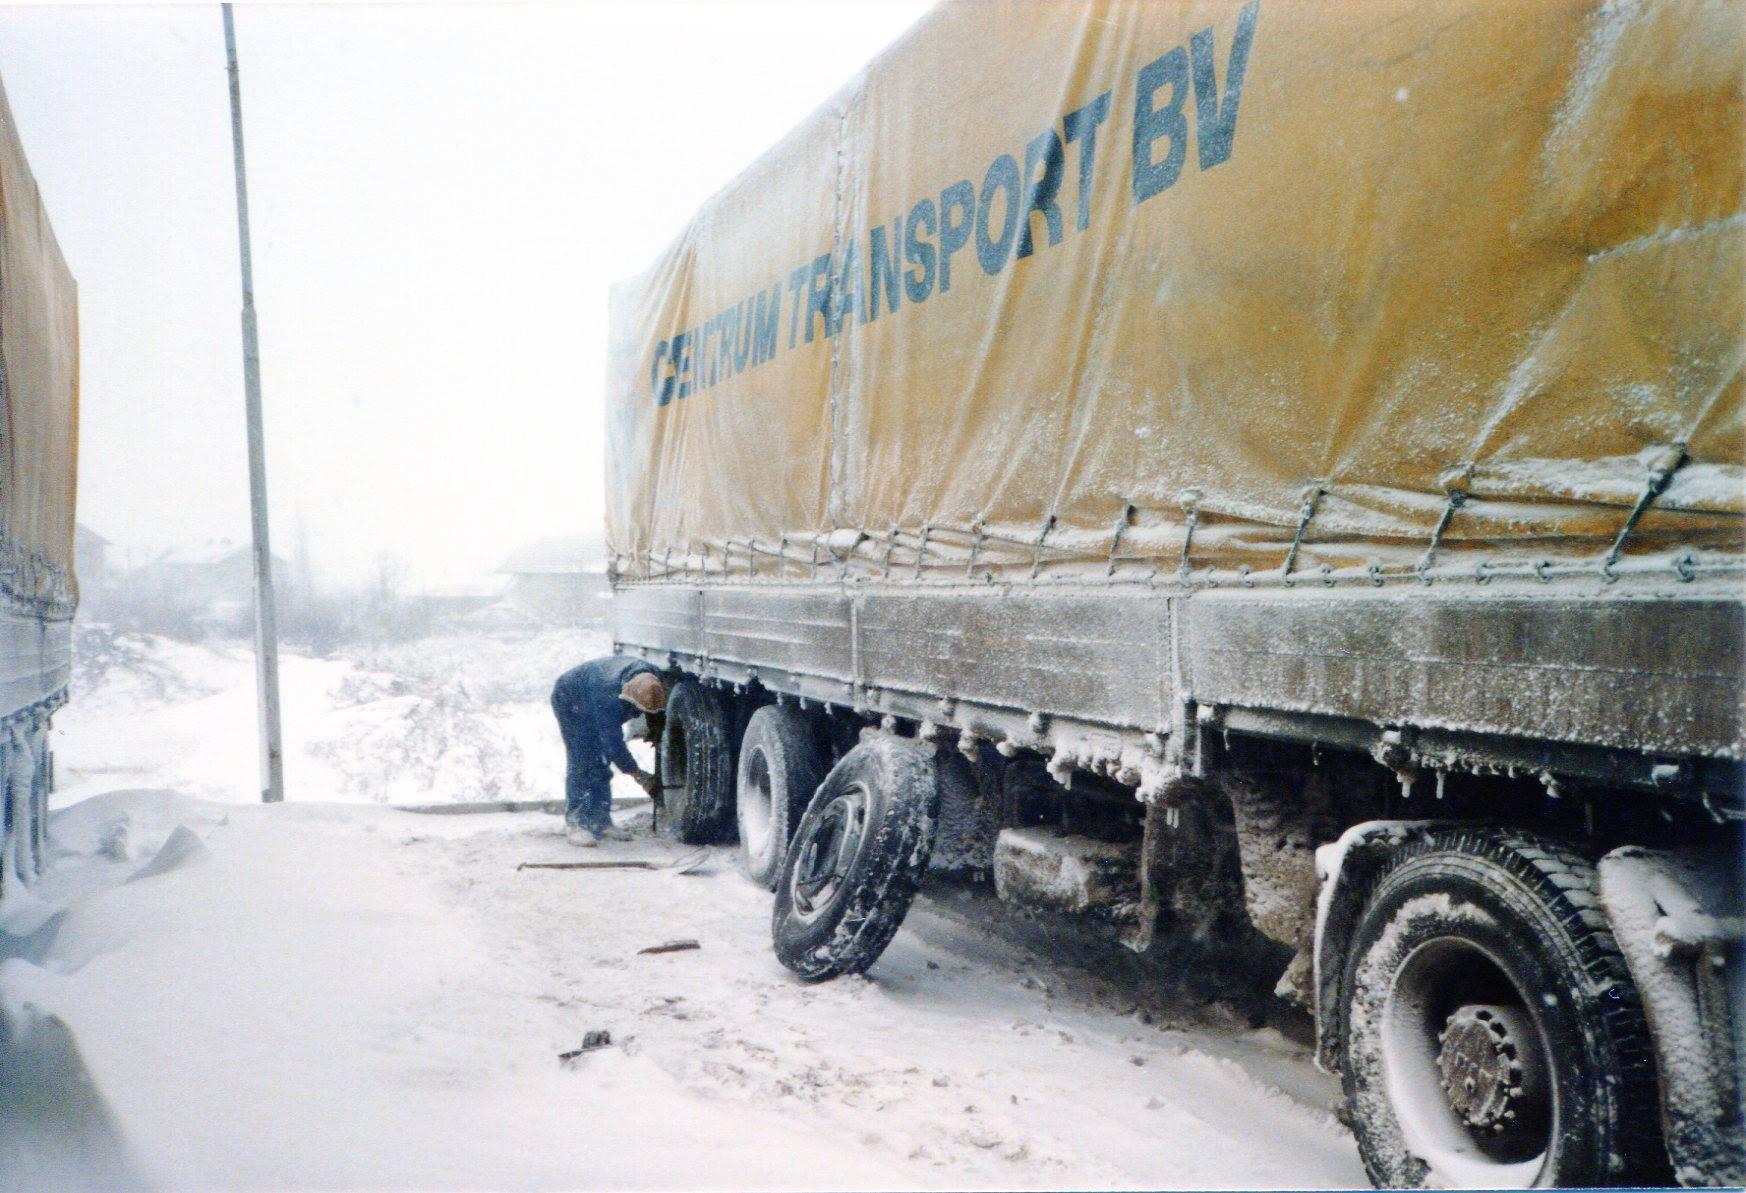 Hans-Anthonise-midden-oosten-transport-13